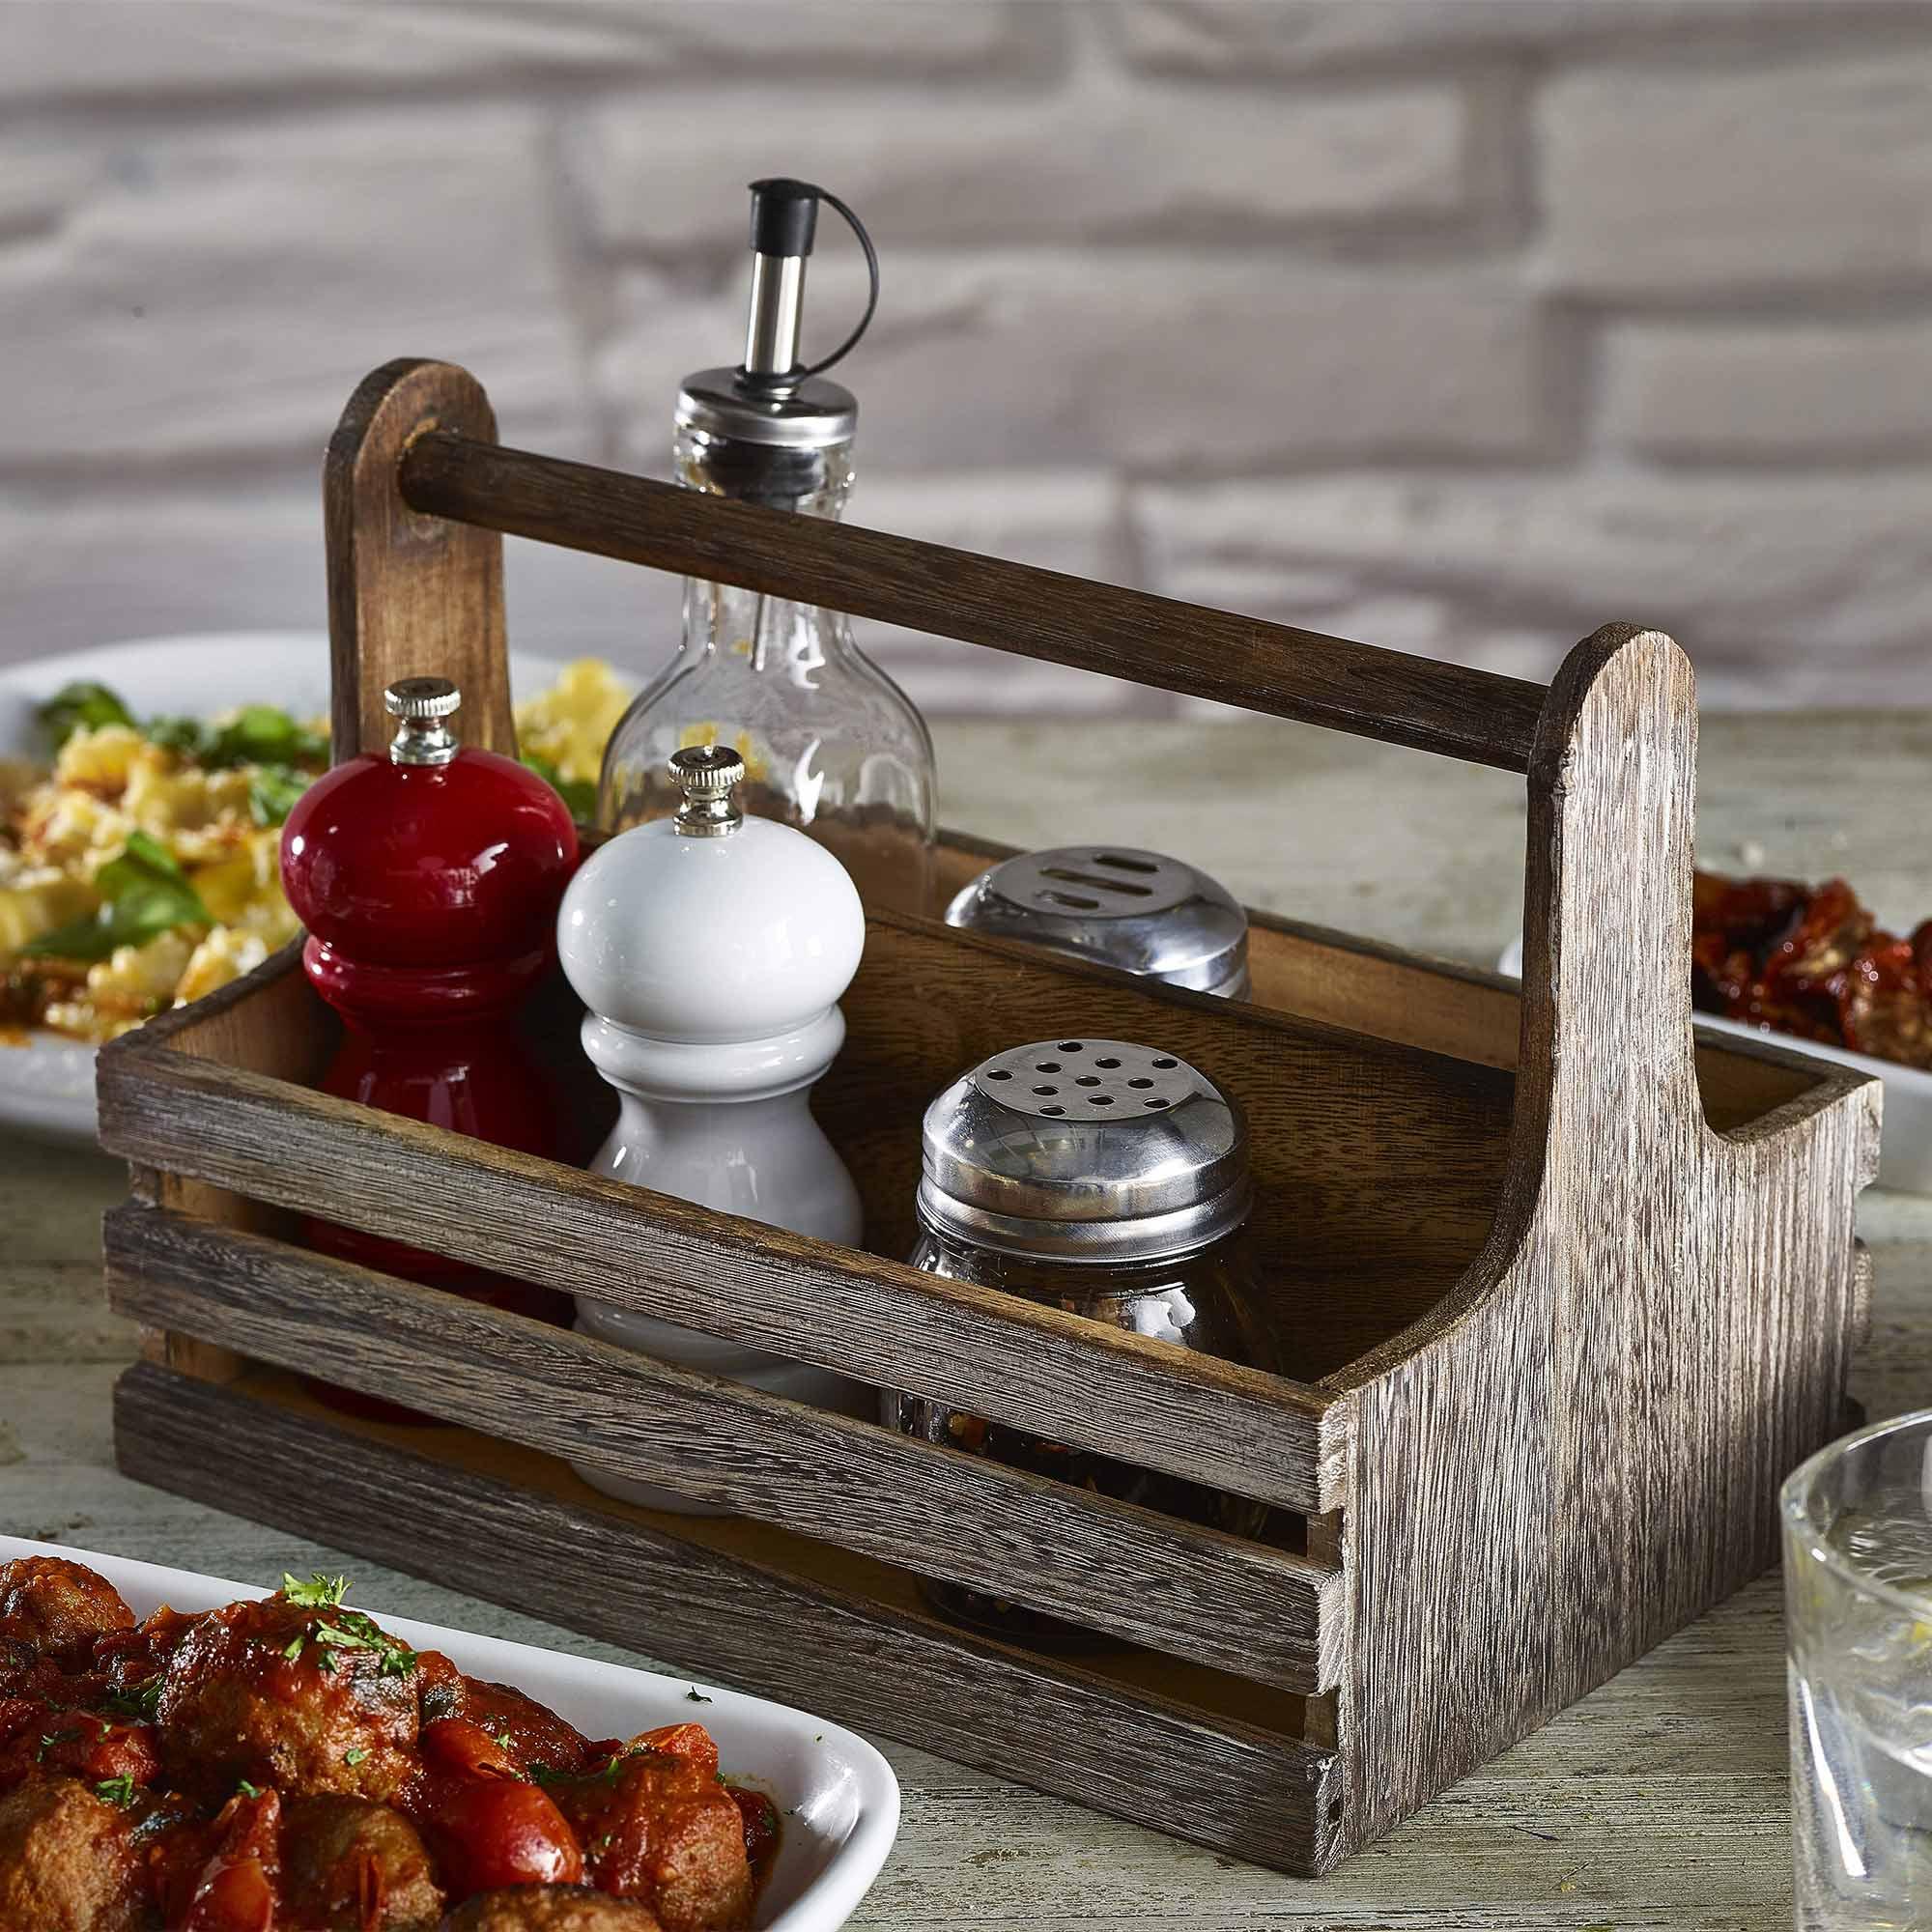 Genware Rustic Wooden Table Caddy